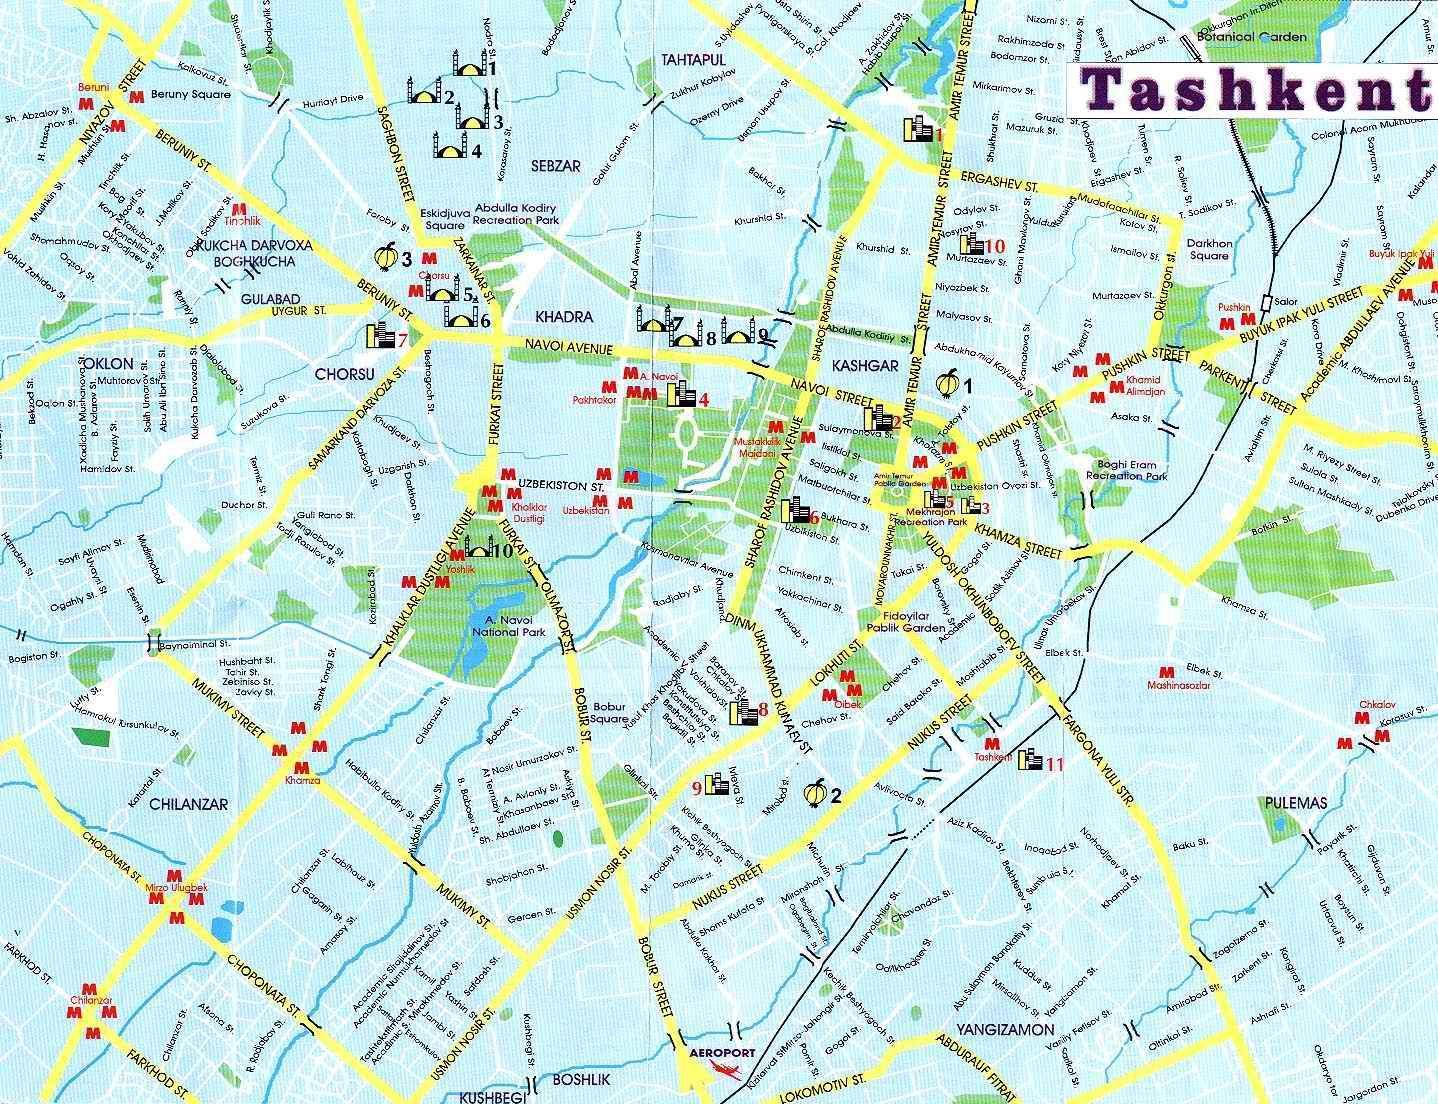 Tashkent Uzbekistan Tourist Map - Tashkent Uzbekistan • mappery ...